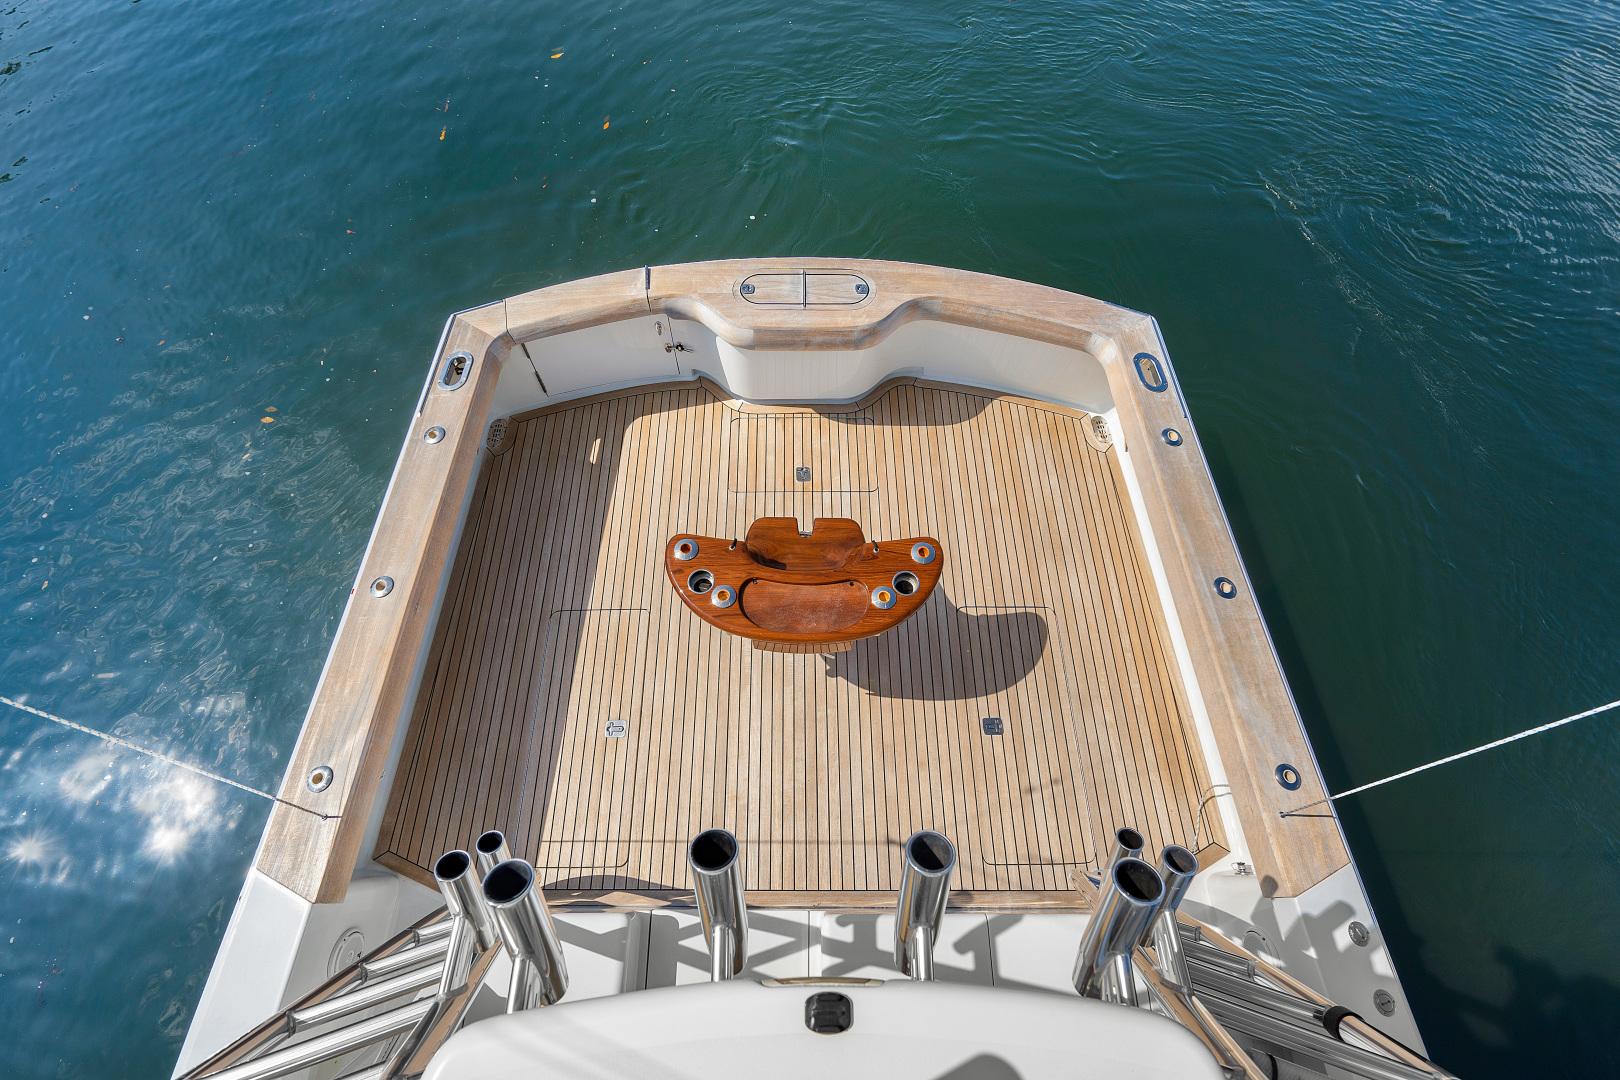 Release-Walkaround 2014-De Bowat Palm Beach Gardens-United States-1364504 | Thumbnail